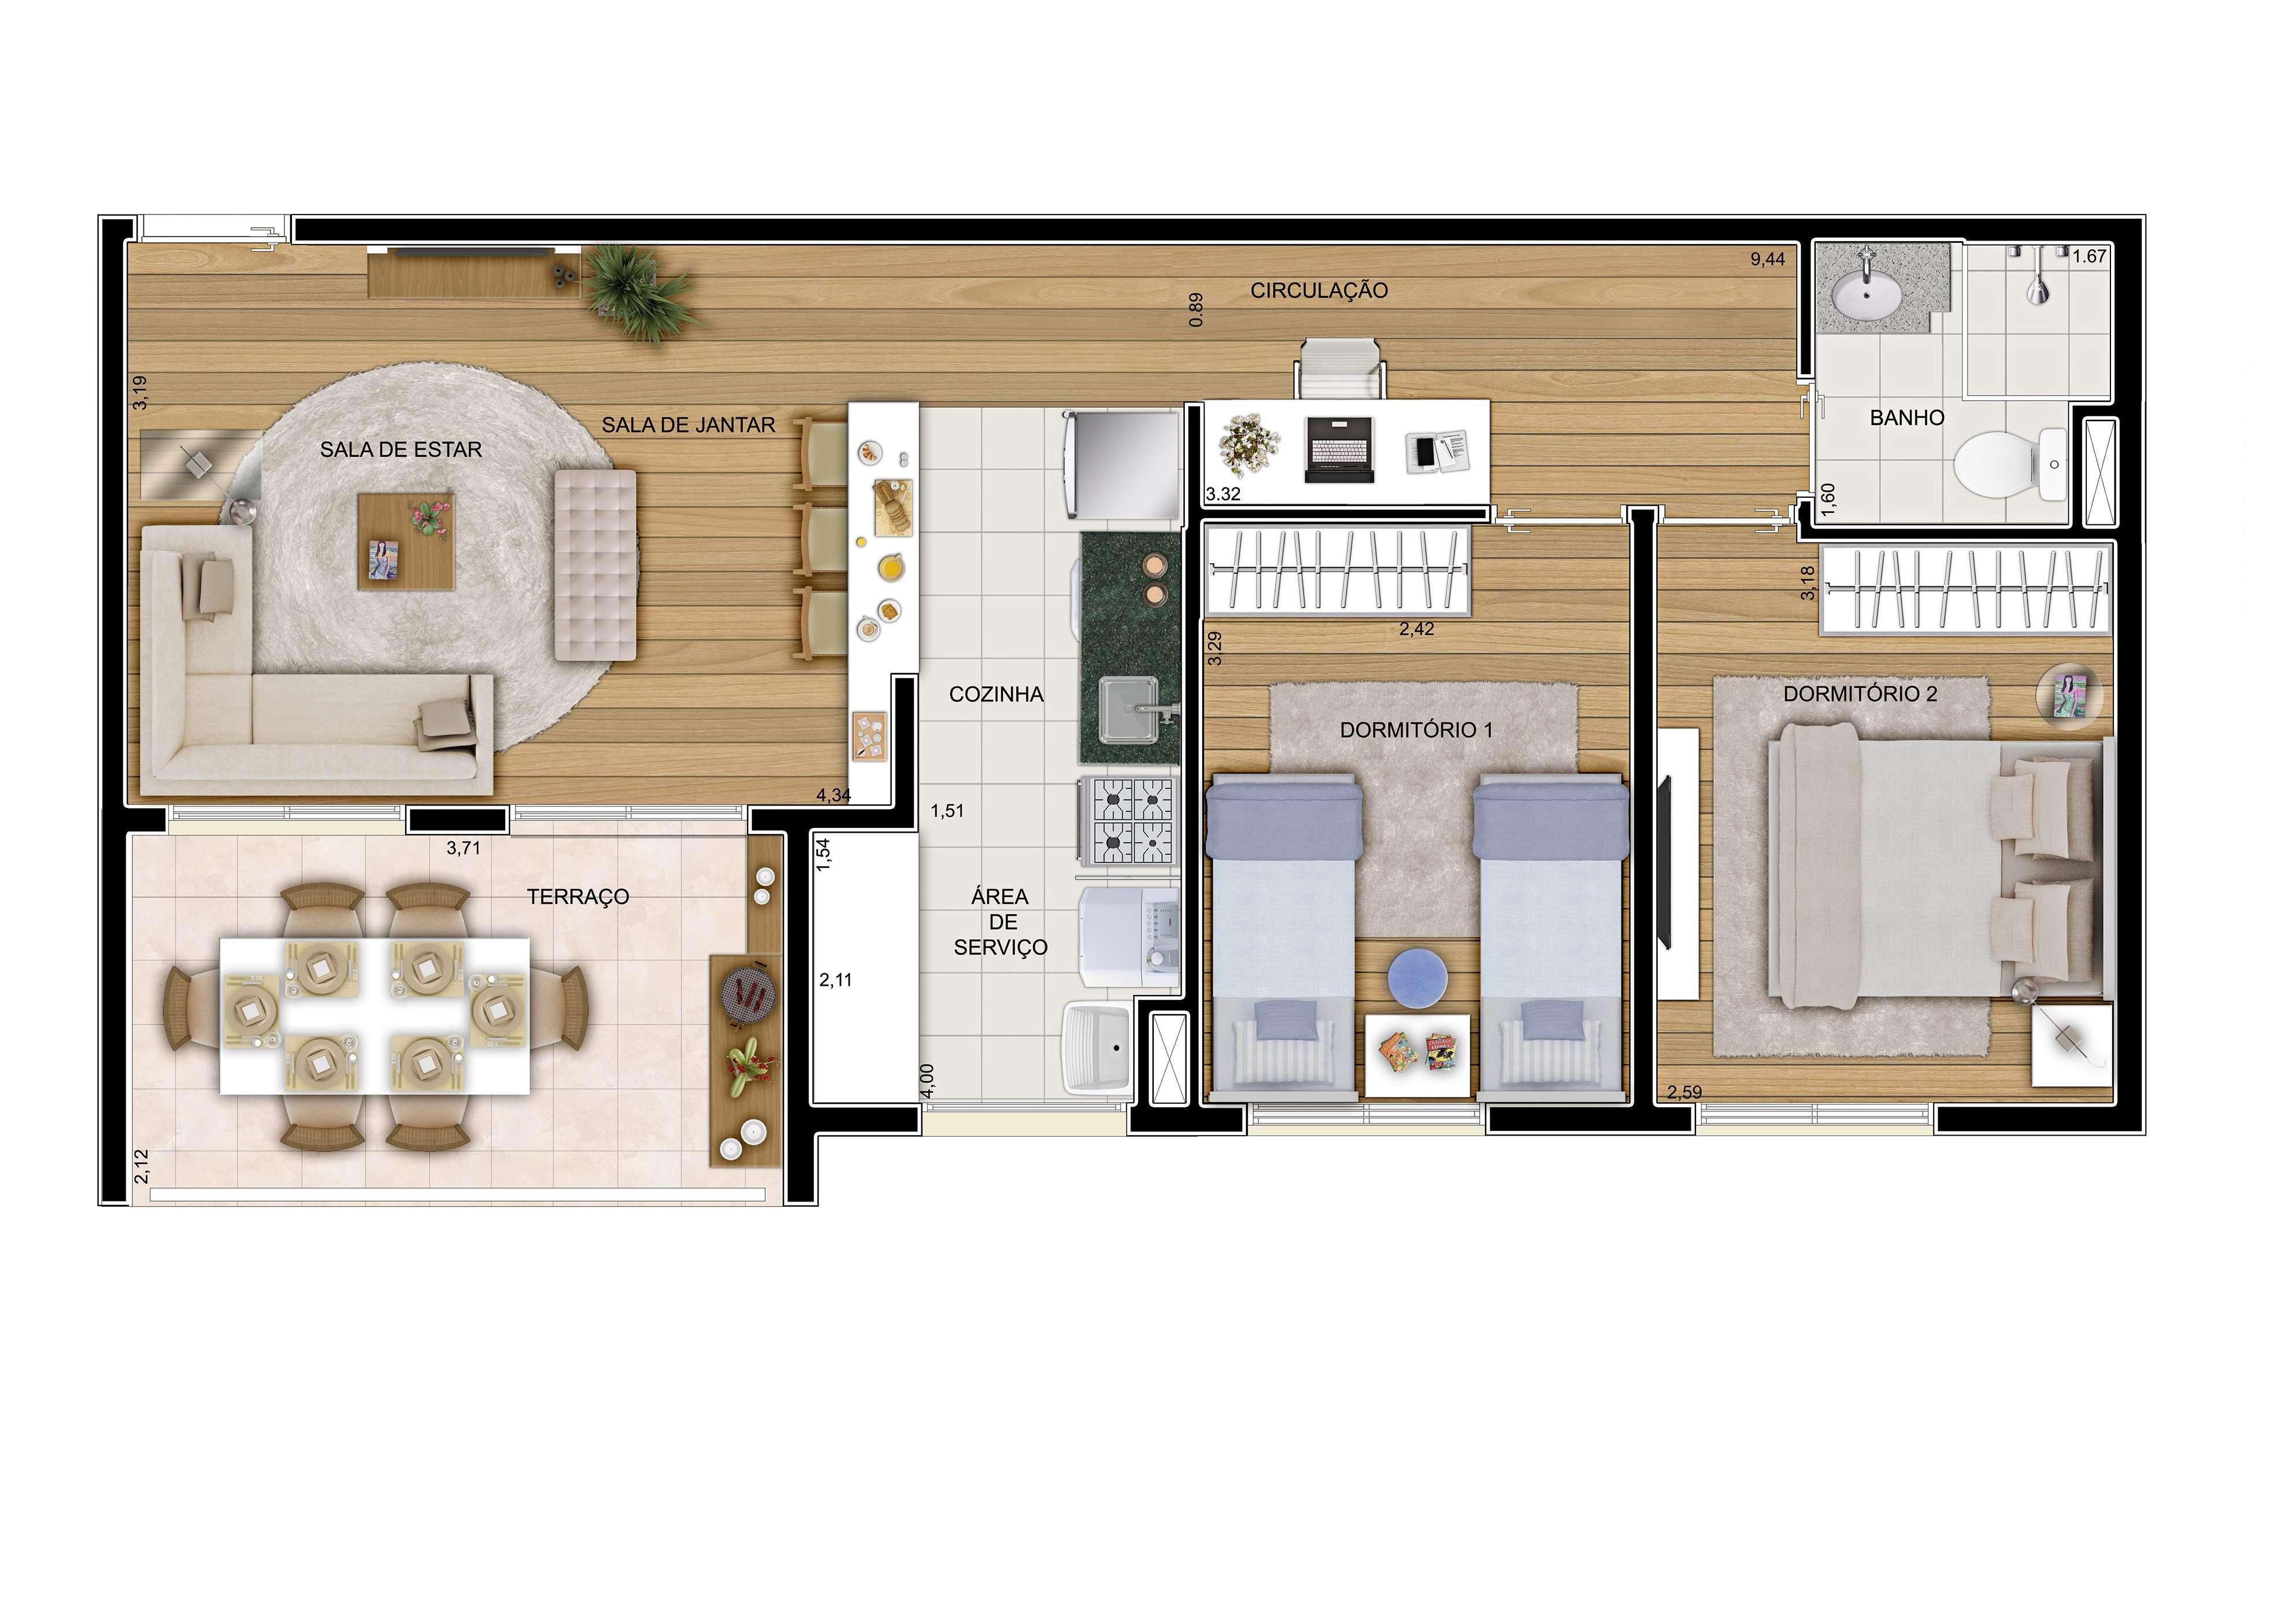 62 m² - 2 dorms